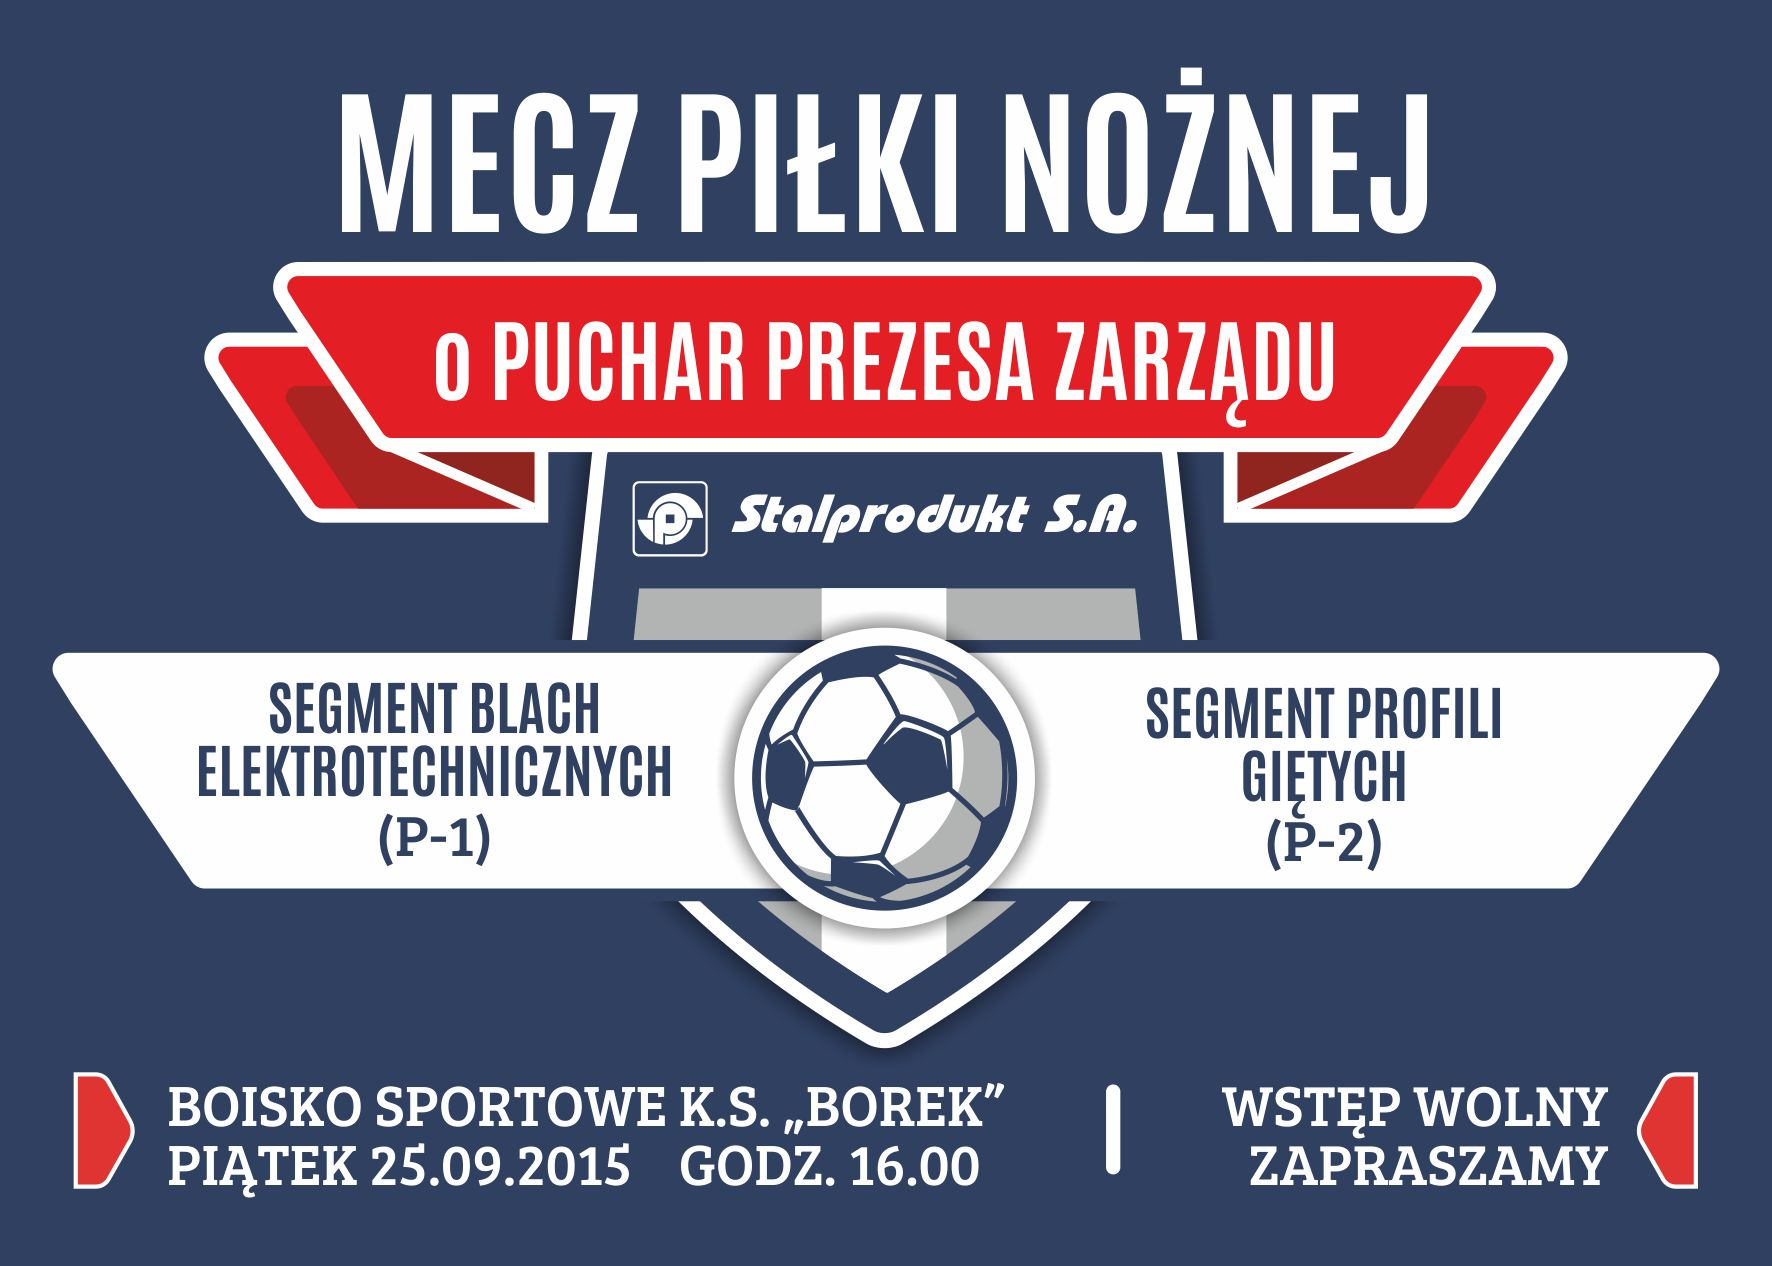 plakat_B2_puchar_prezesa_zarzadu_stalprodukt_sa_v1